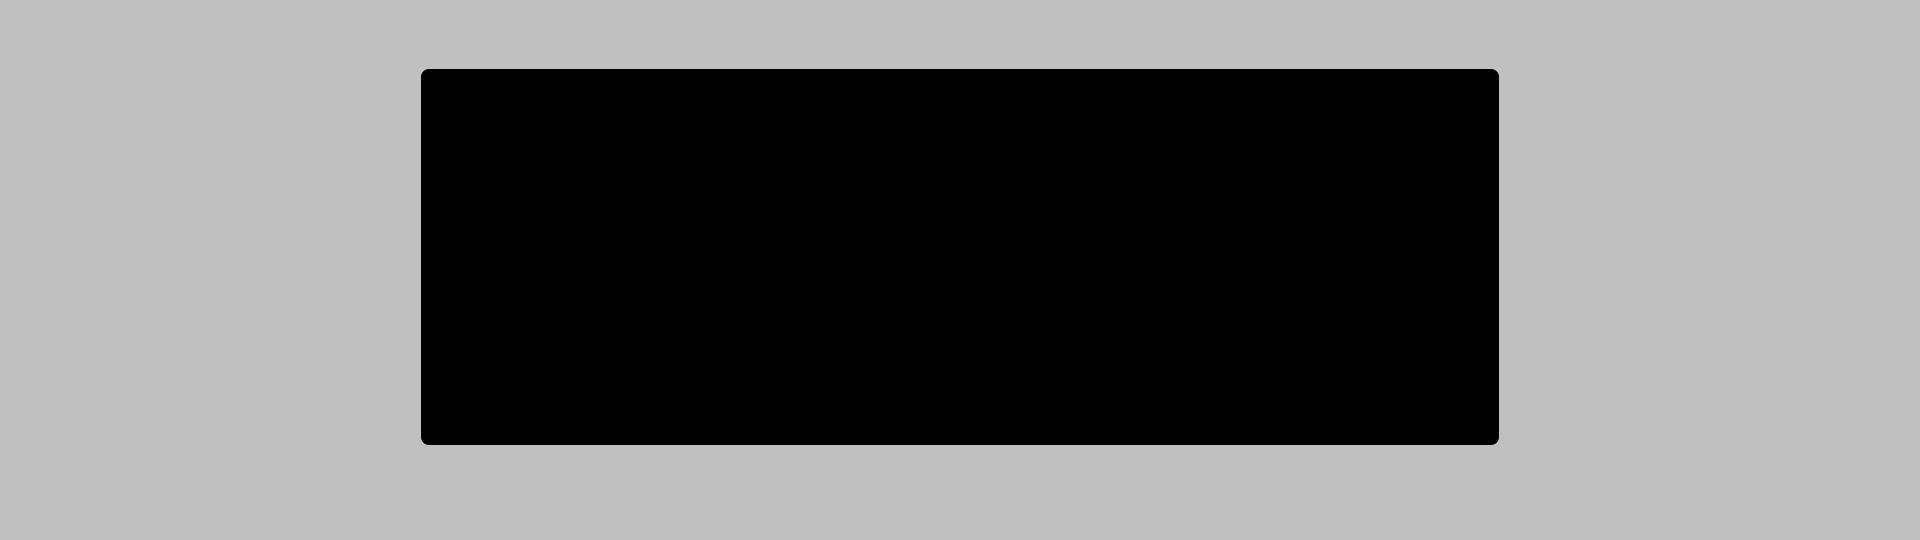 CATEGORY-MBLYA-AYDINLATMAVEDEKORASYON50-13-08